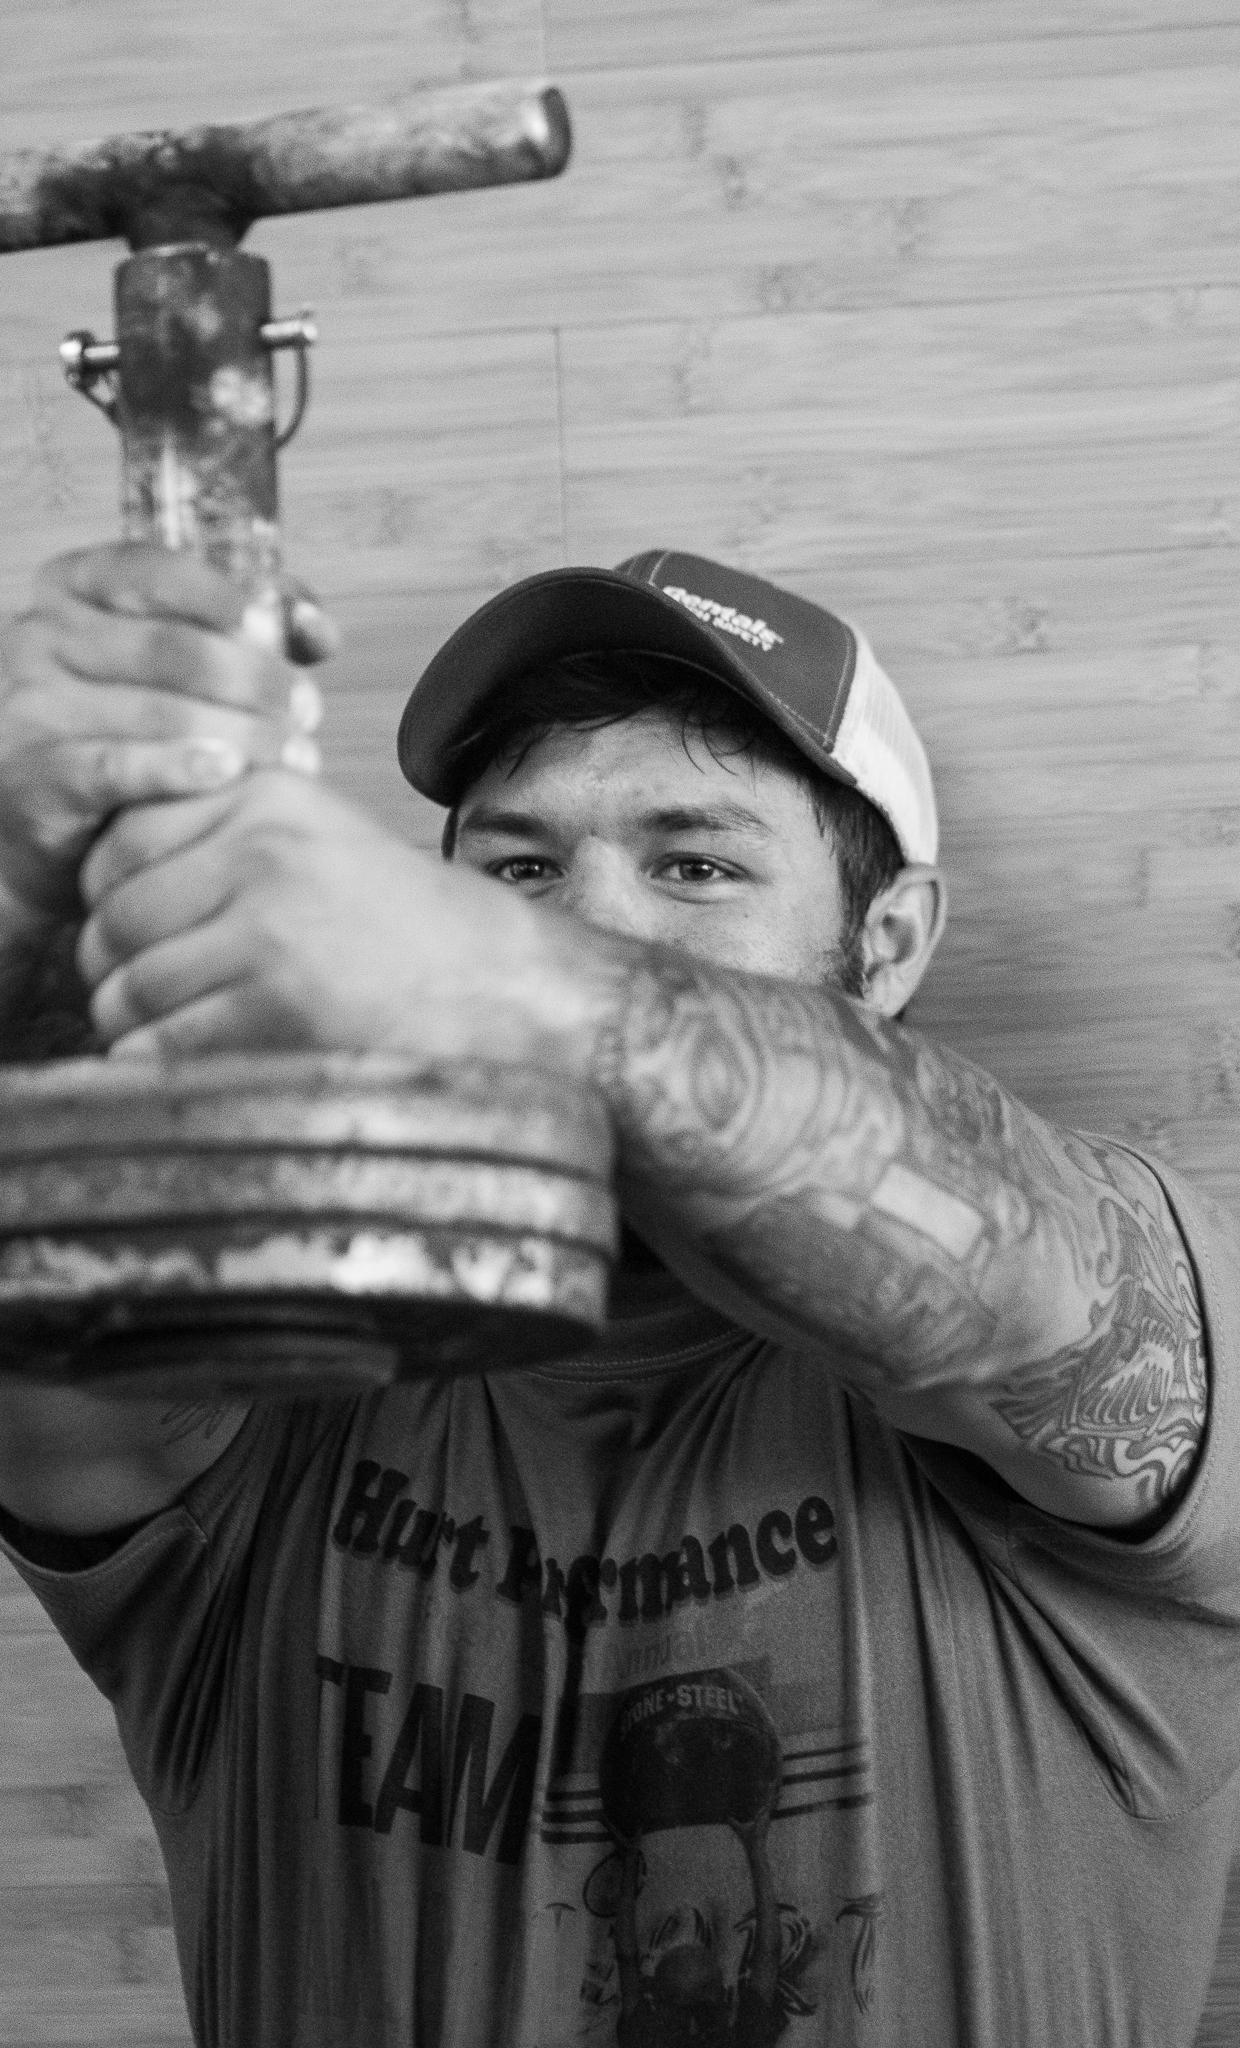 hurt-performance-4th-annual-little-viking-charity-washingtonville-new-york-strongman-eveyrdaylifters-vp (63 of 166).jpg